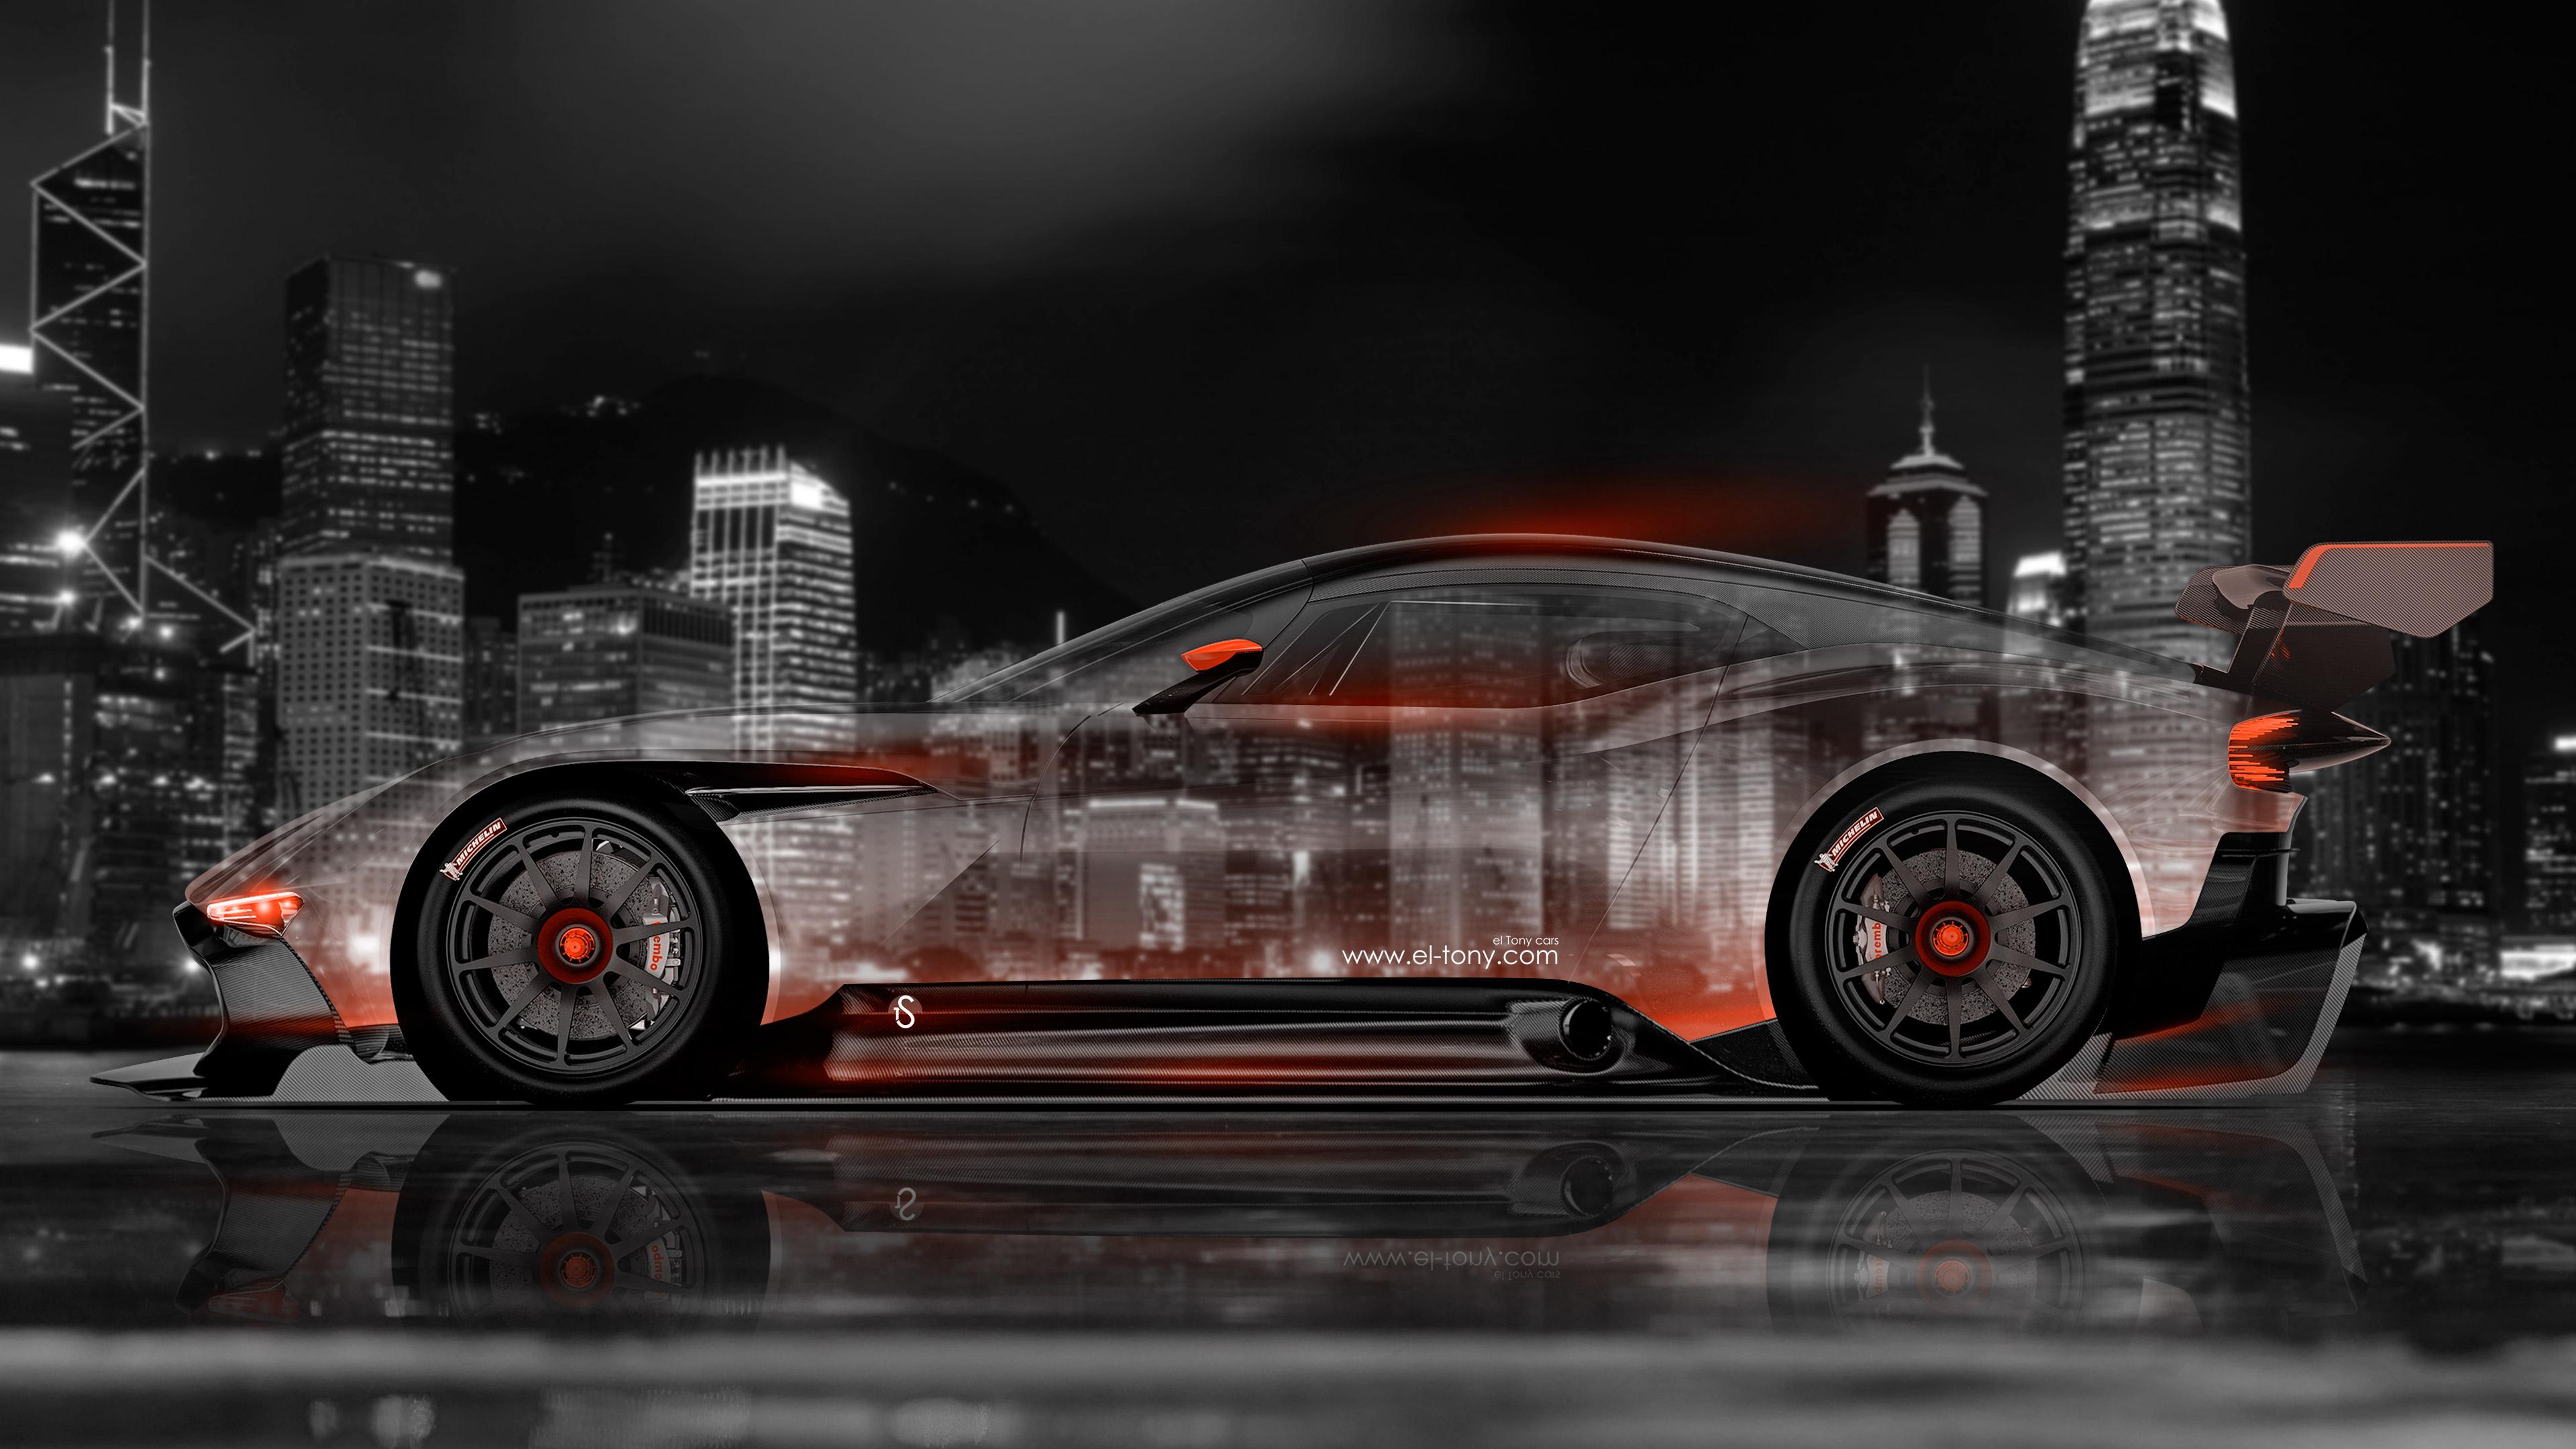 Aston Martin Vulcan Side Crystal City Car 2015 el Tony 3840x2160